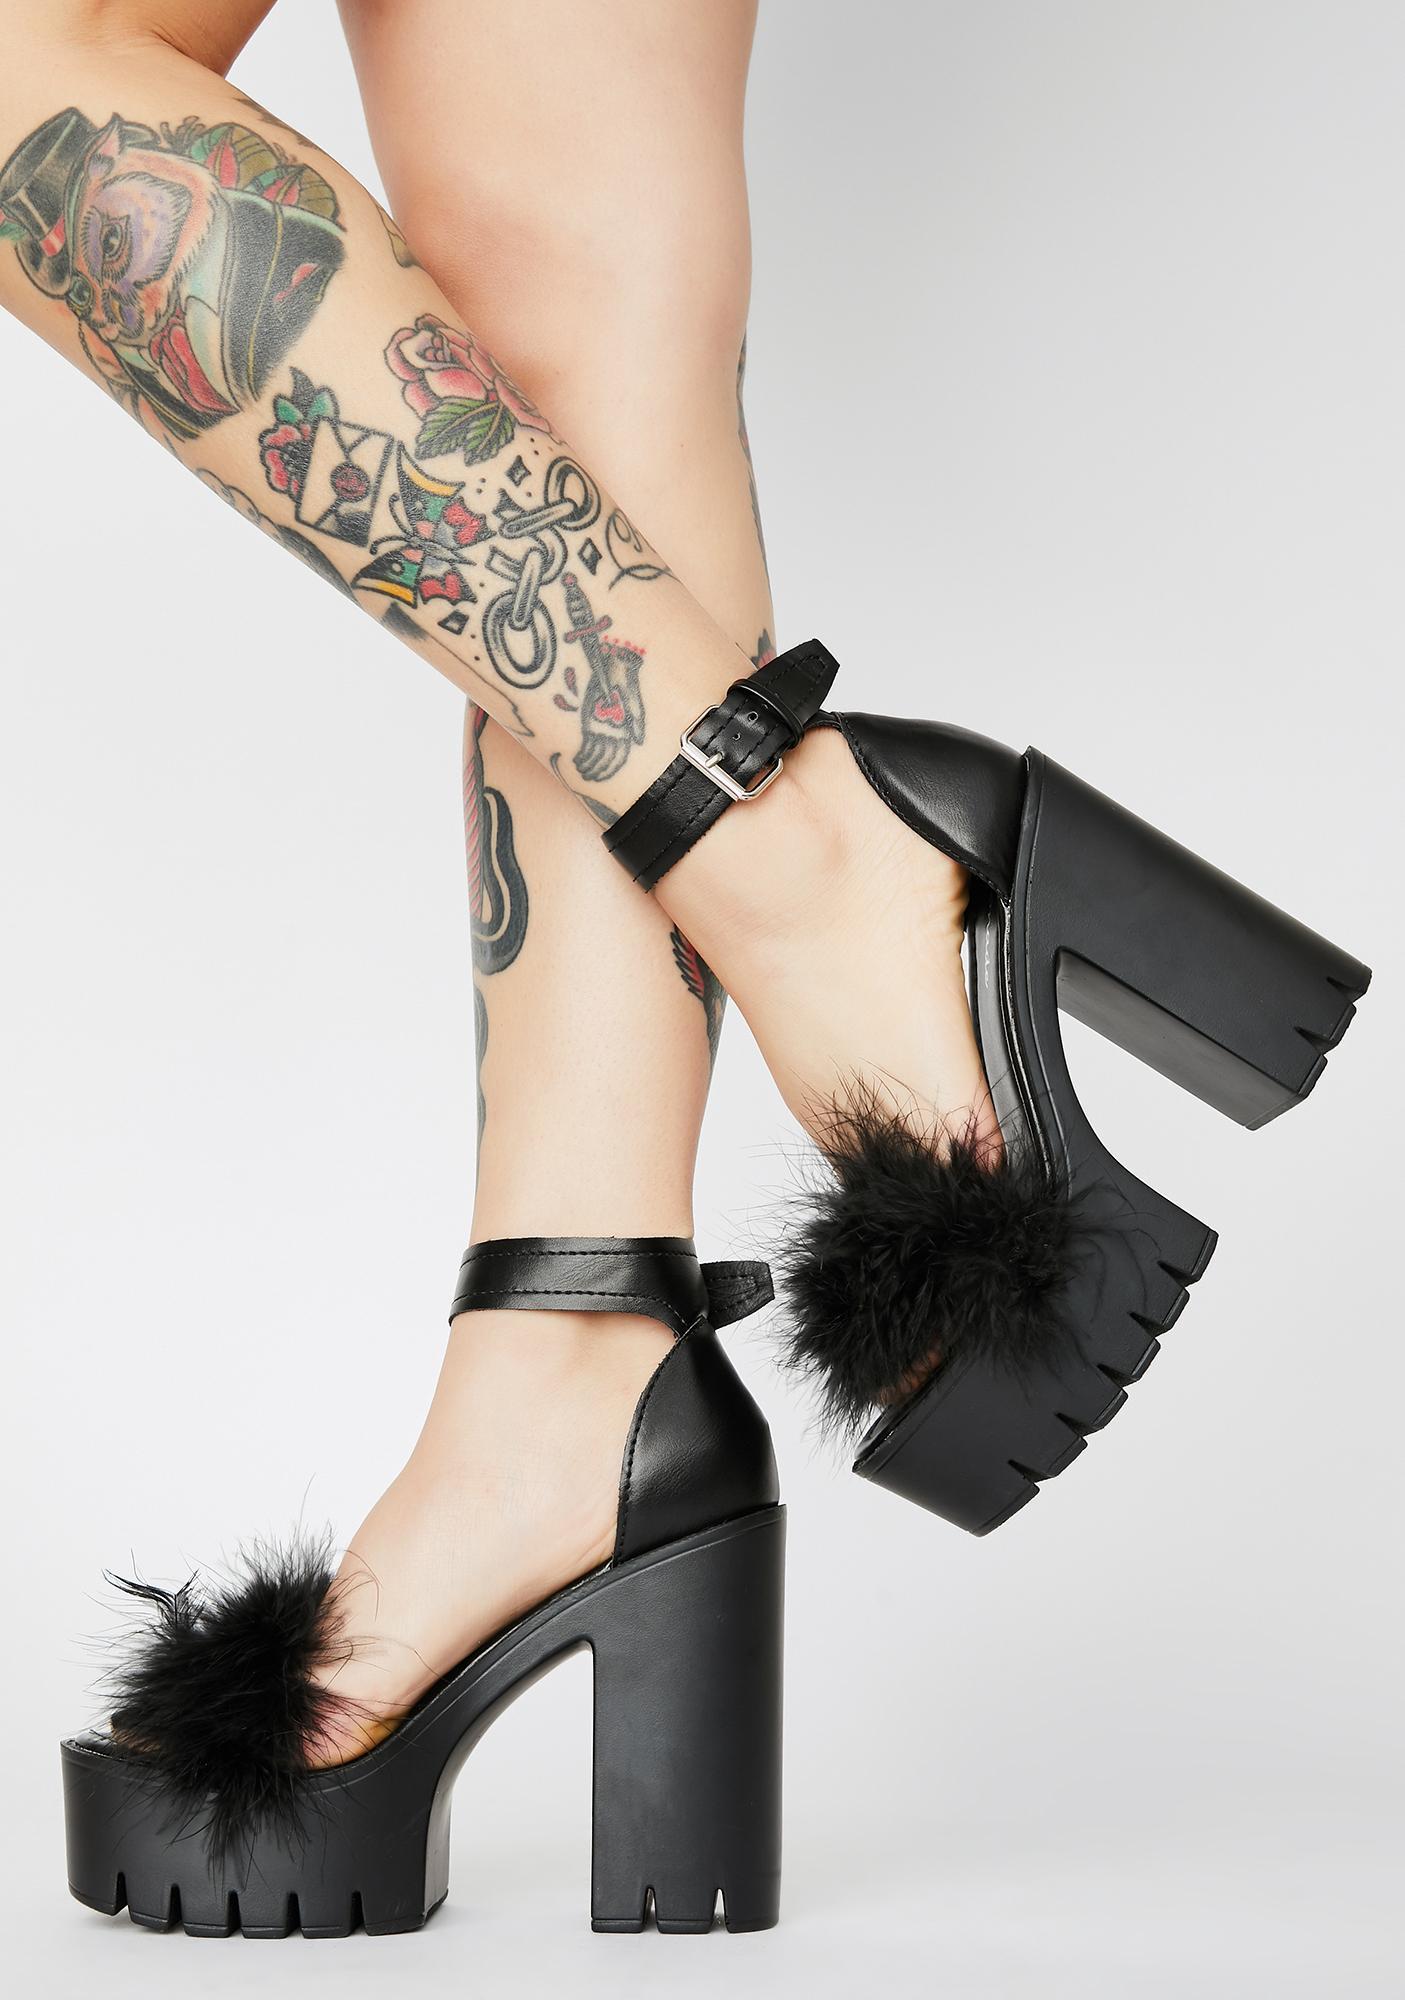 Just Say So Marabou Heels